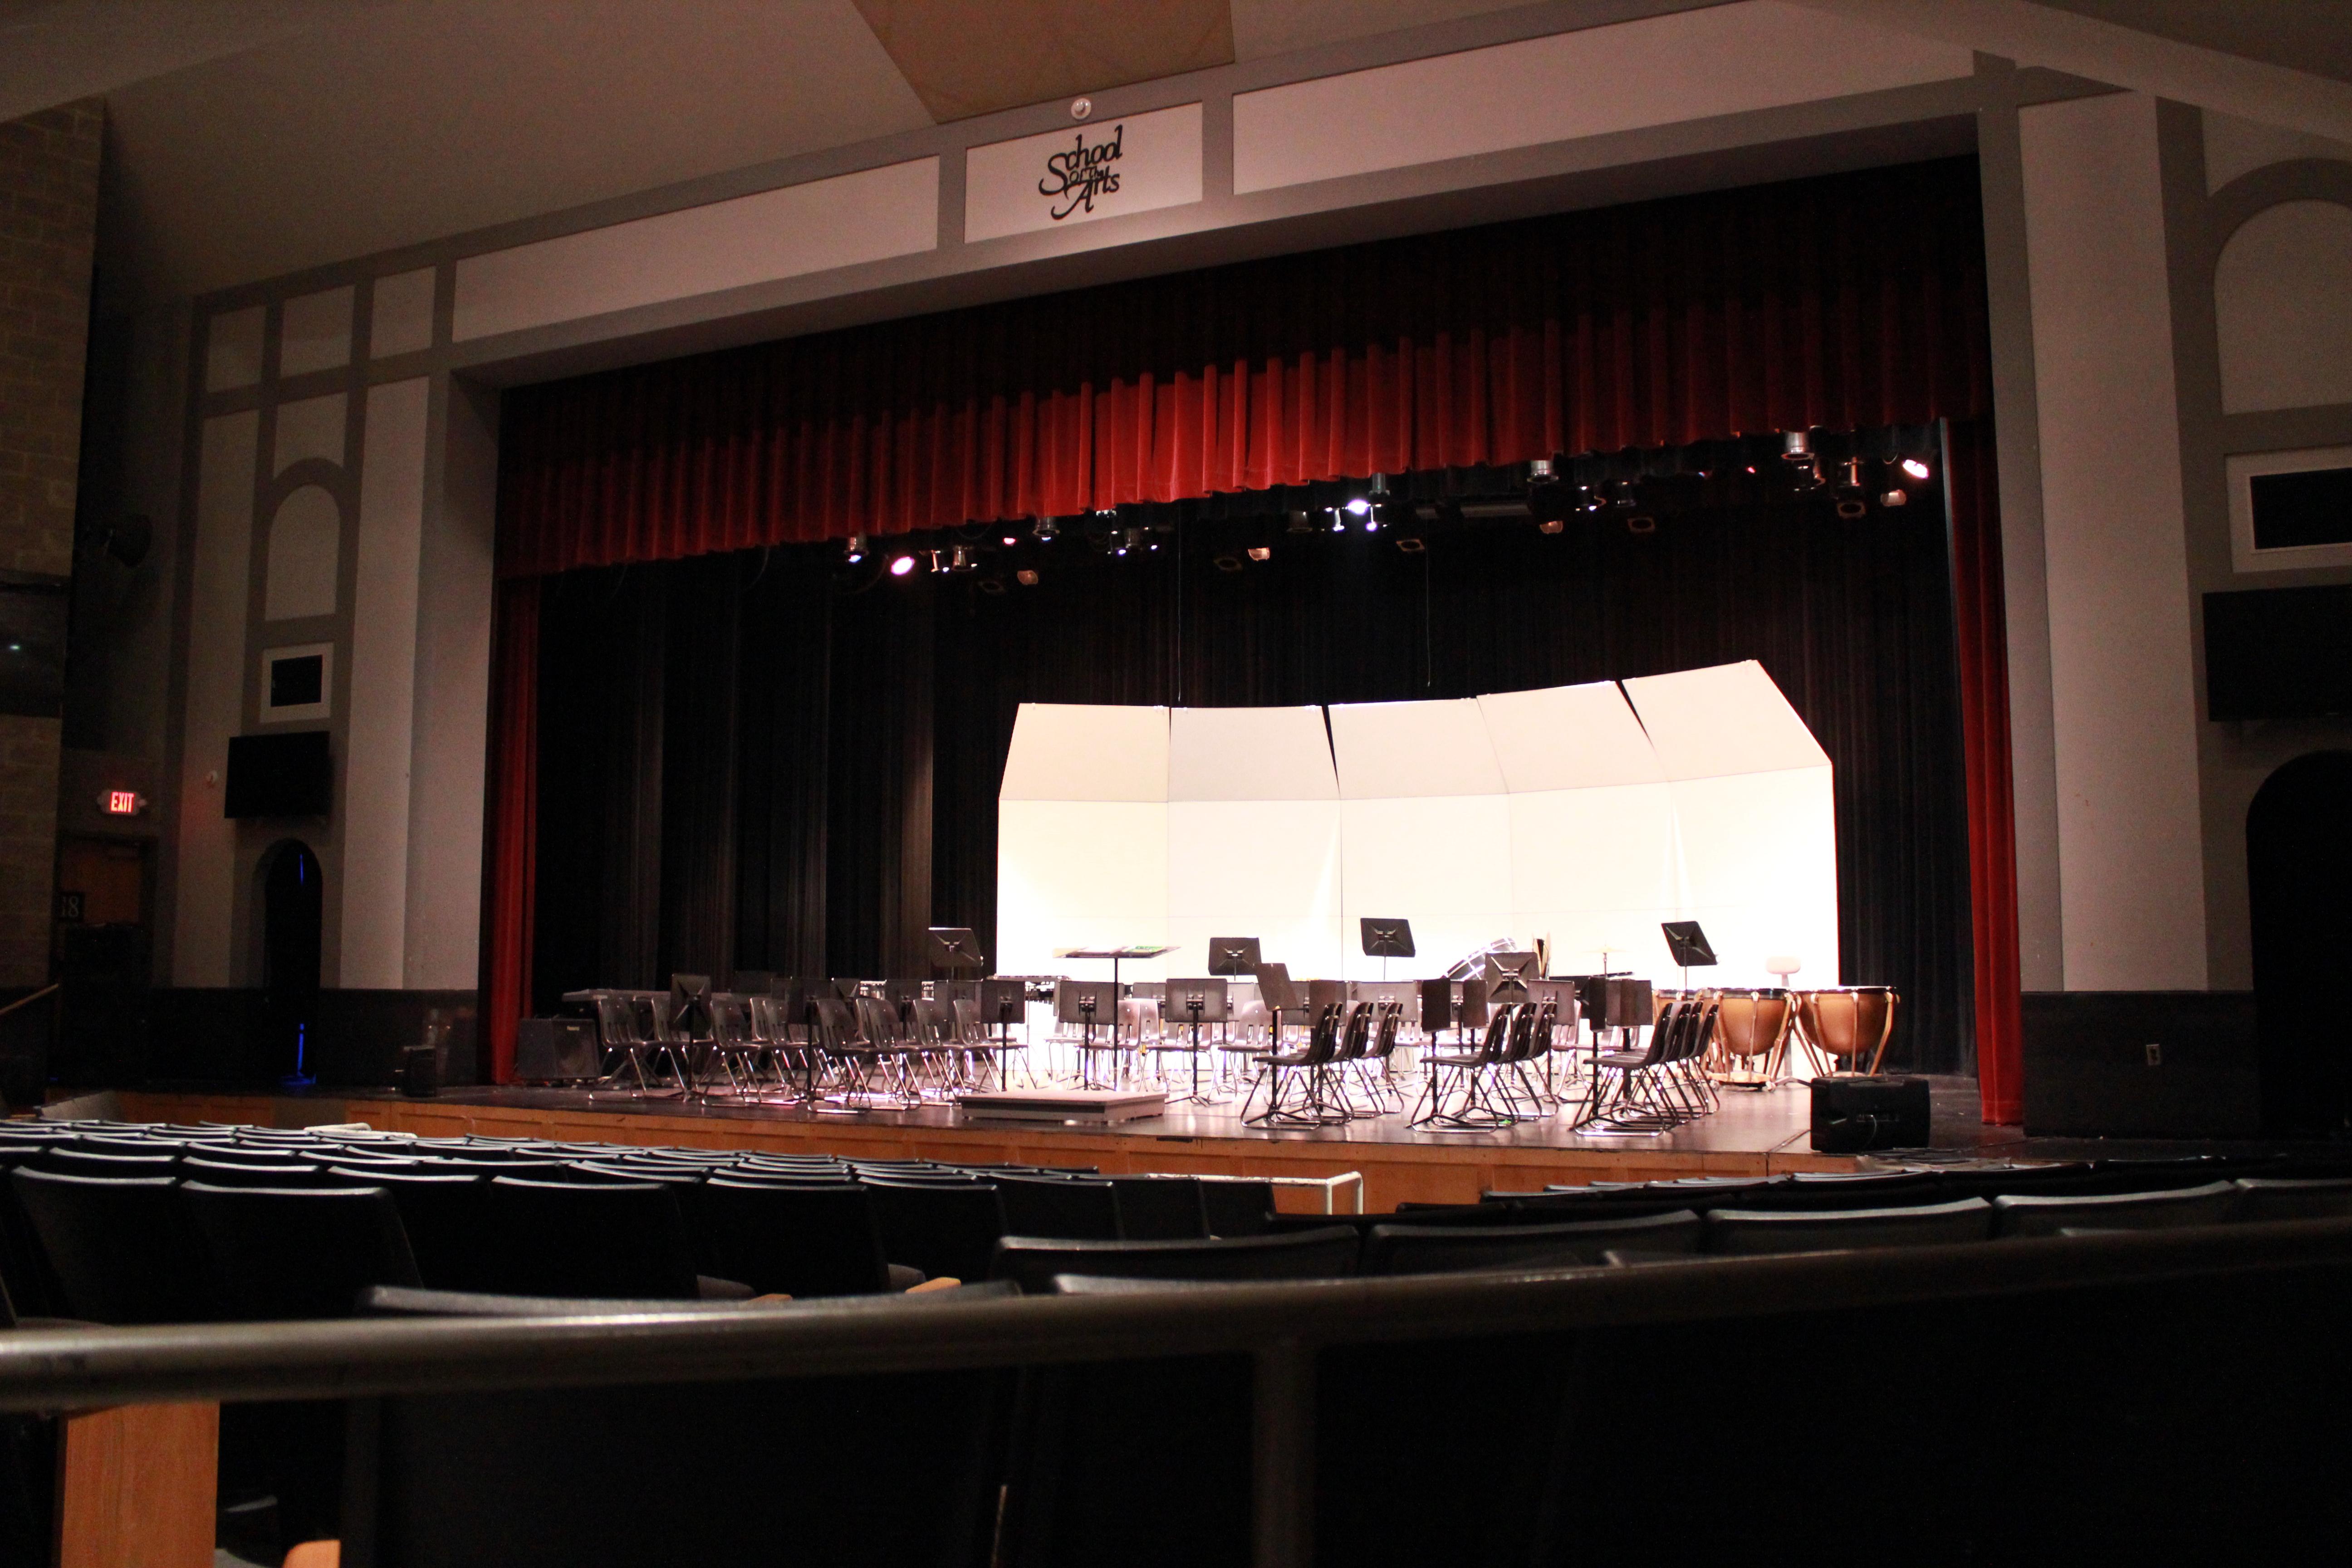 RAPA @ SOTA: Allen Main Stage Theatre